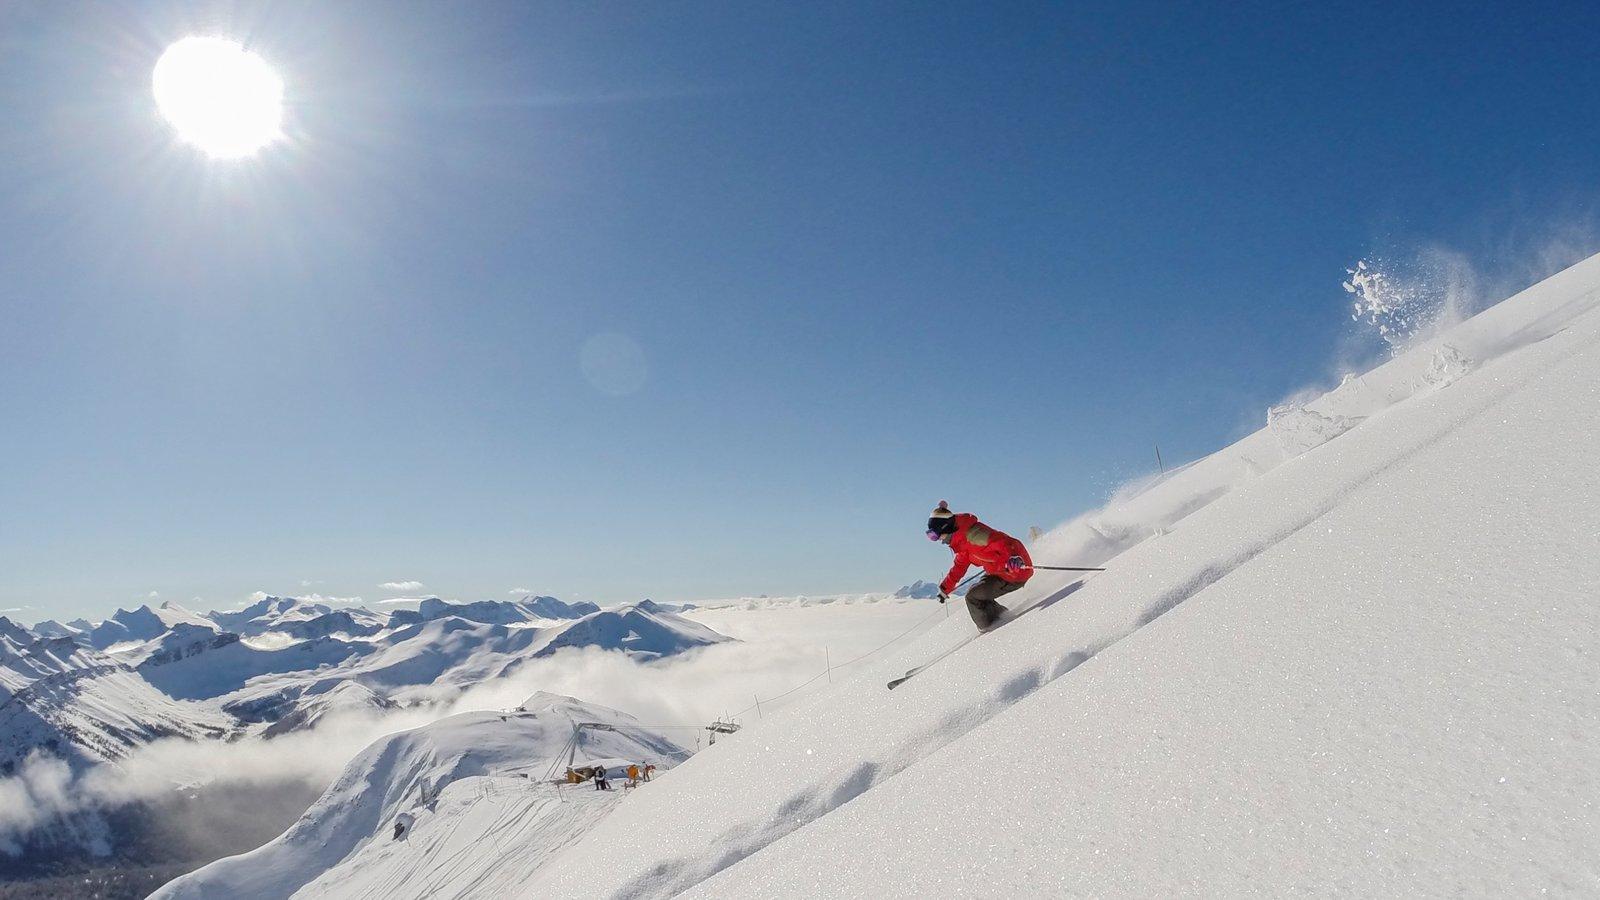 Lake Louise Mountain Resort showing snow skiing, snow and mountains